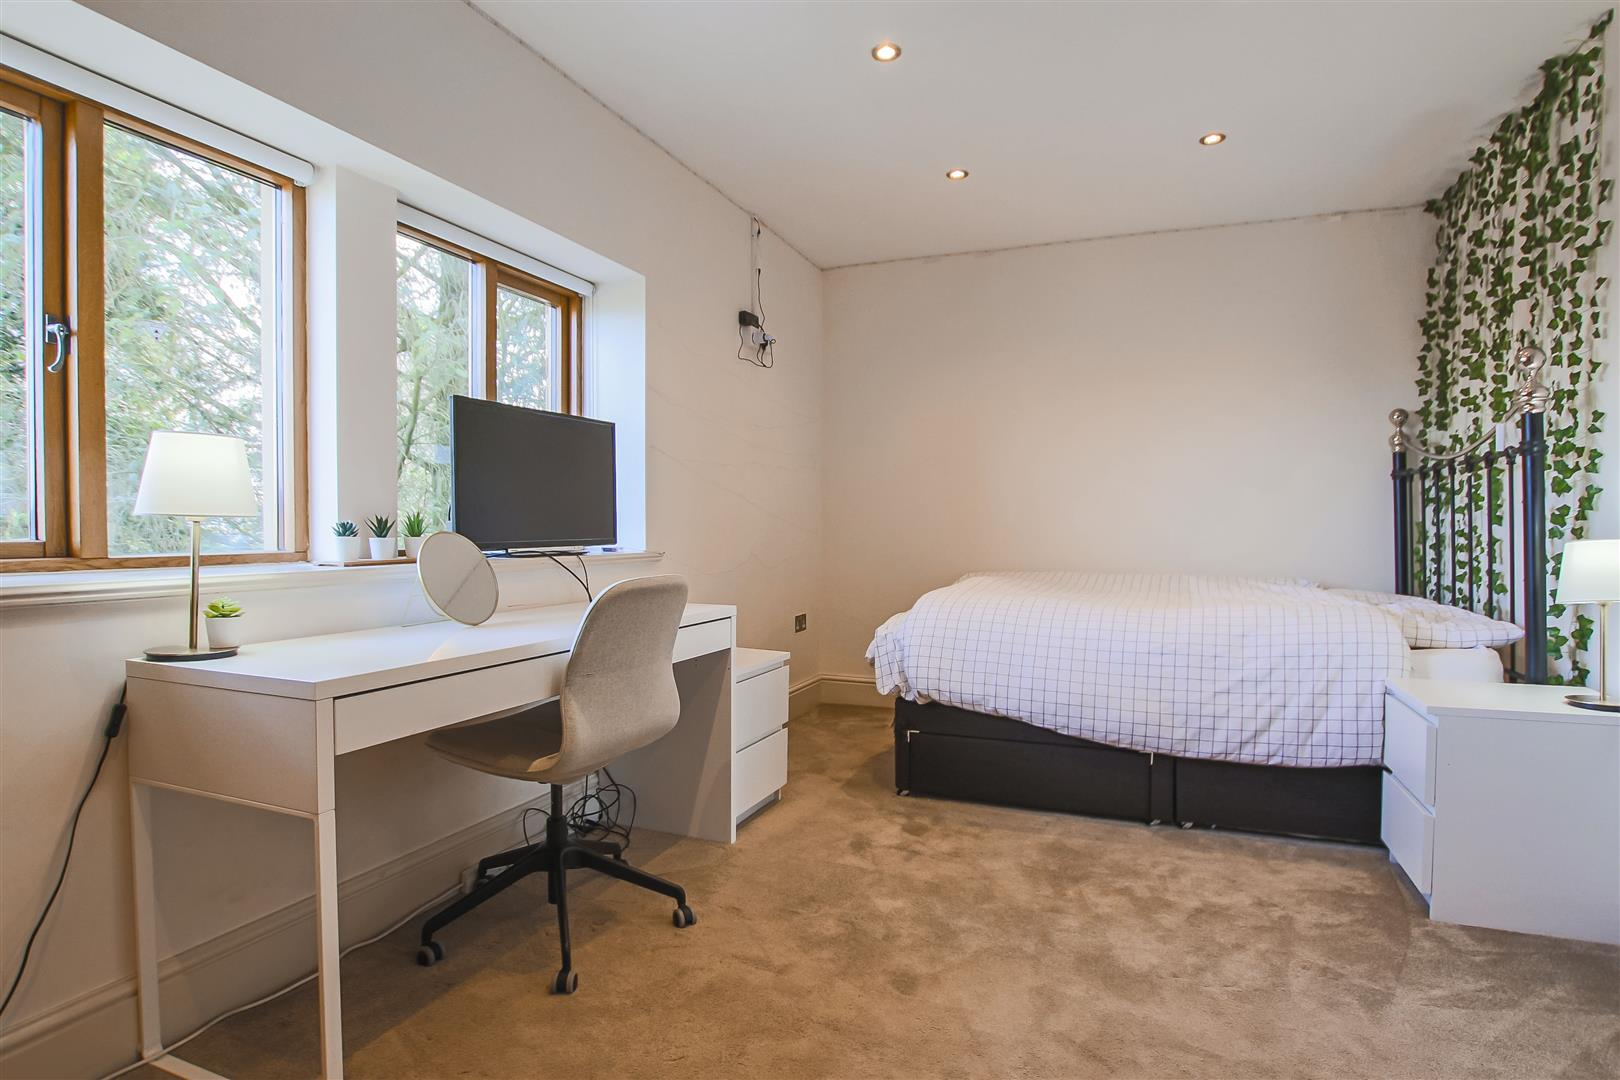 4 Bedroom Detached House For Sale - Farmhouse 11